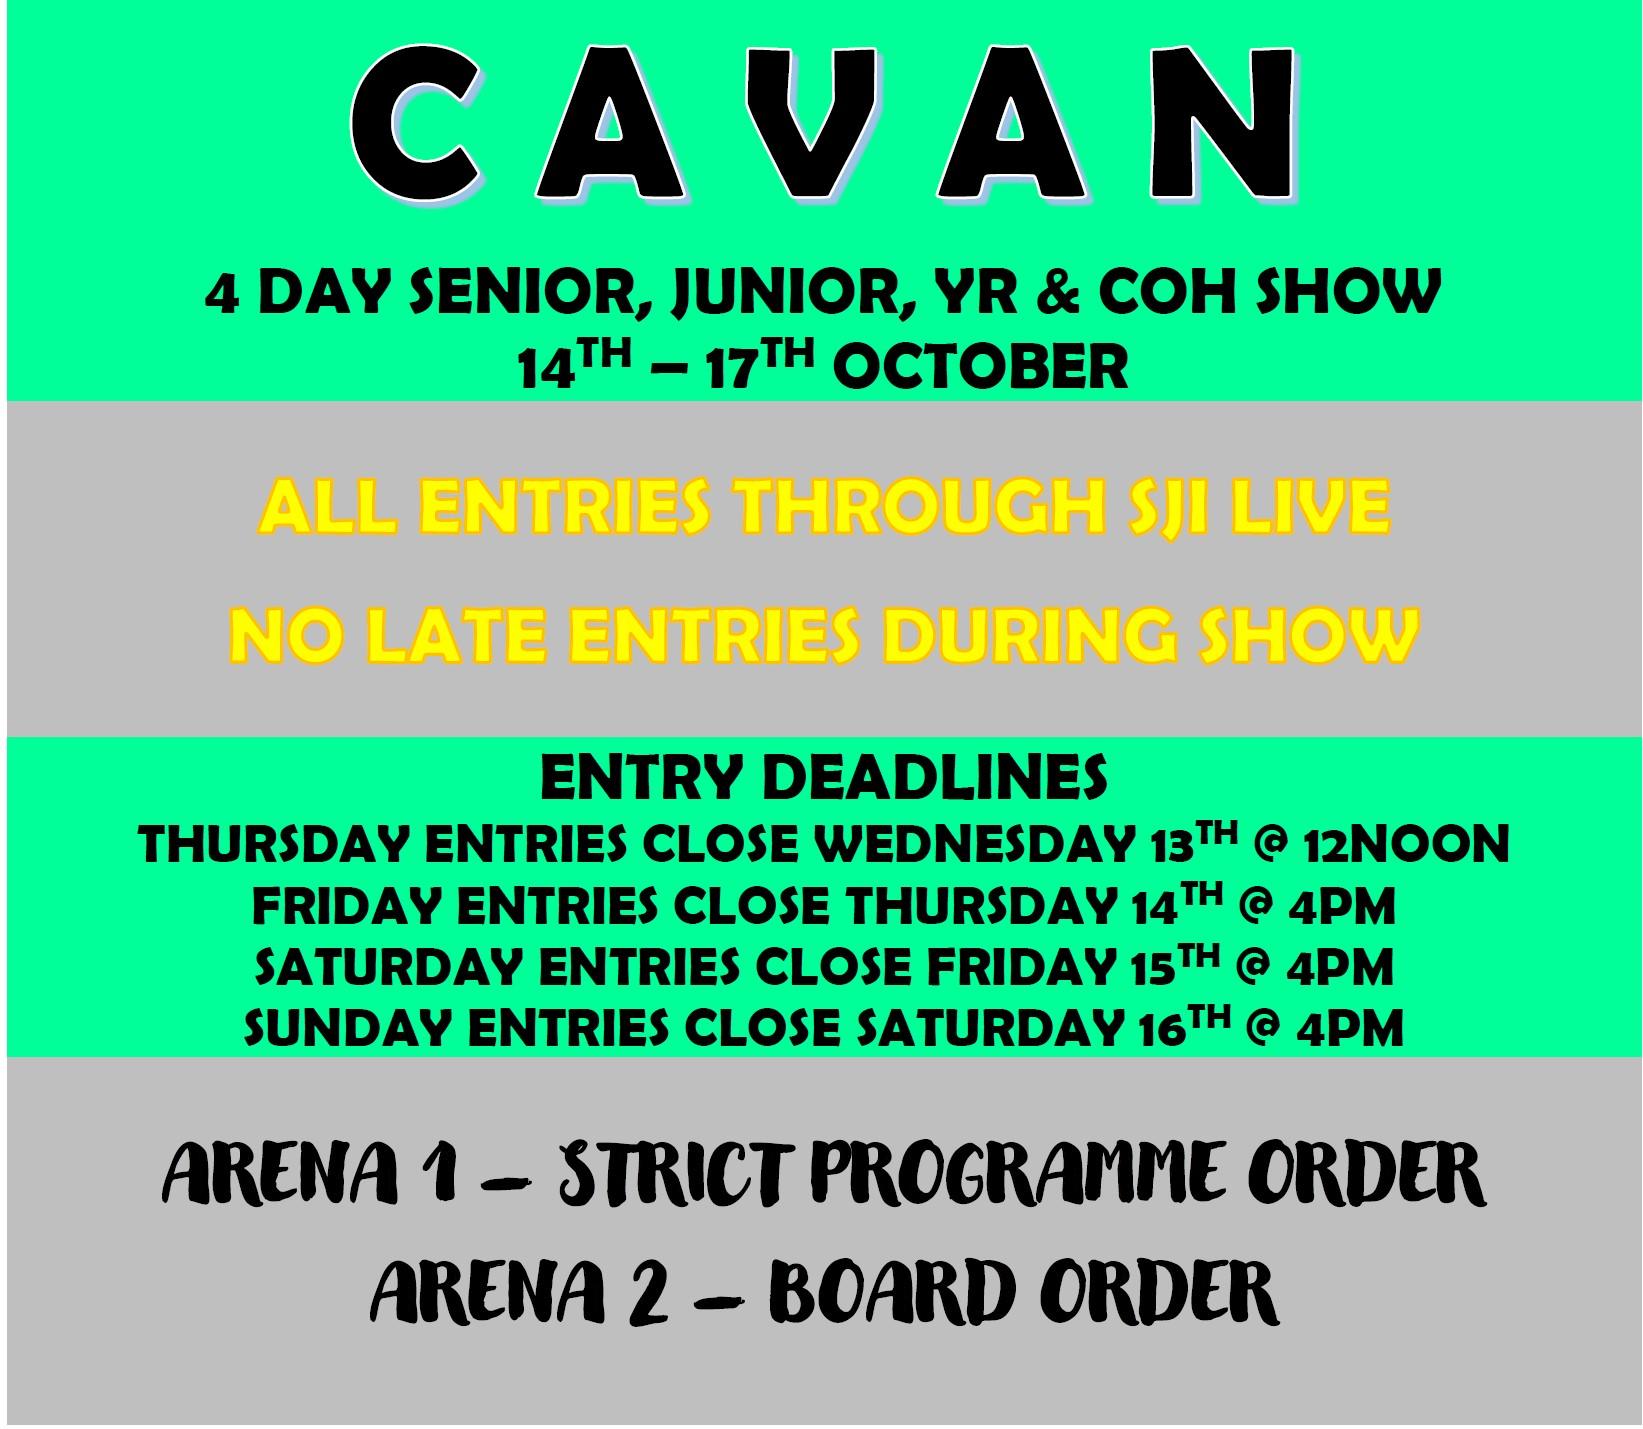 Cavan 4 Day Senior, Junior, YR & COH Show